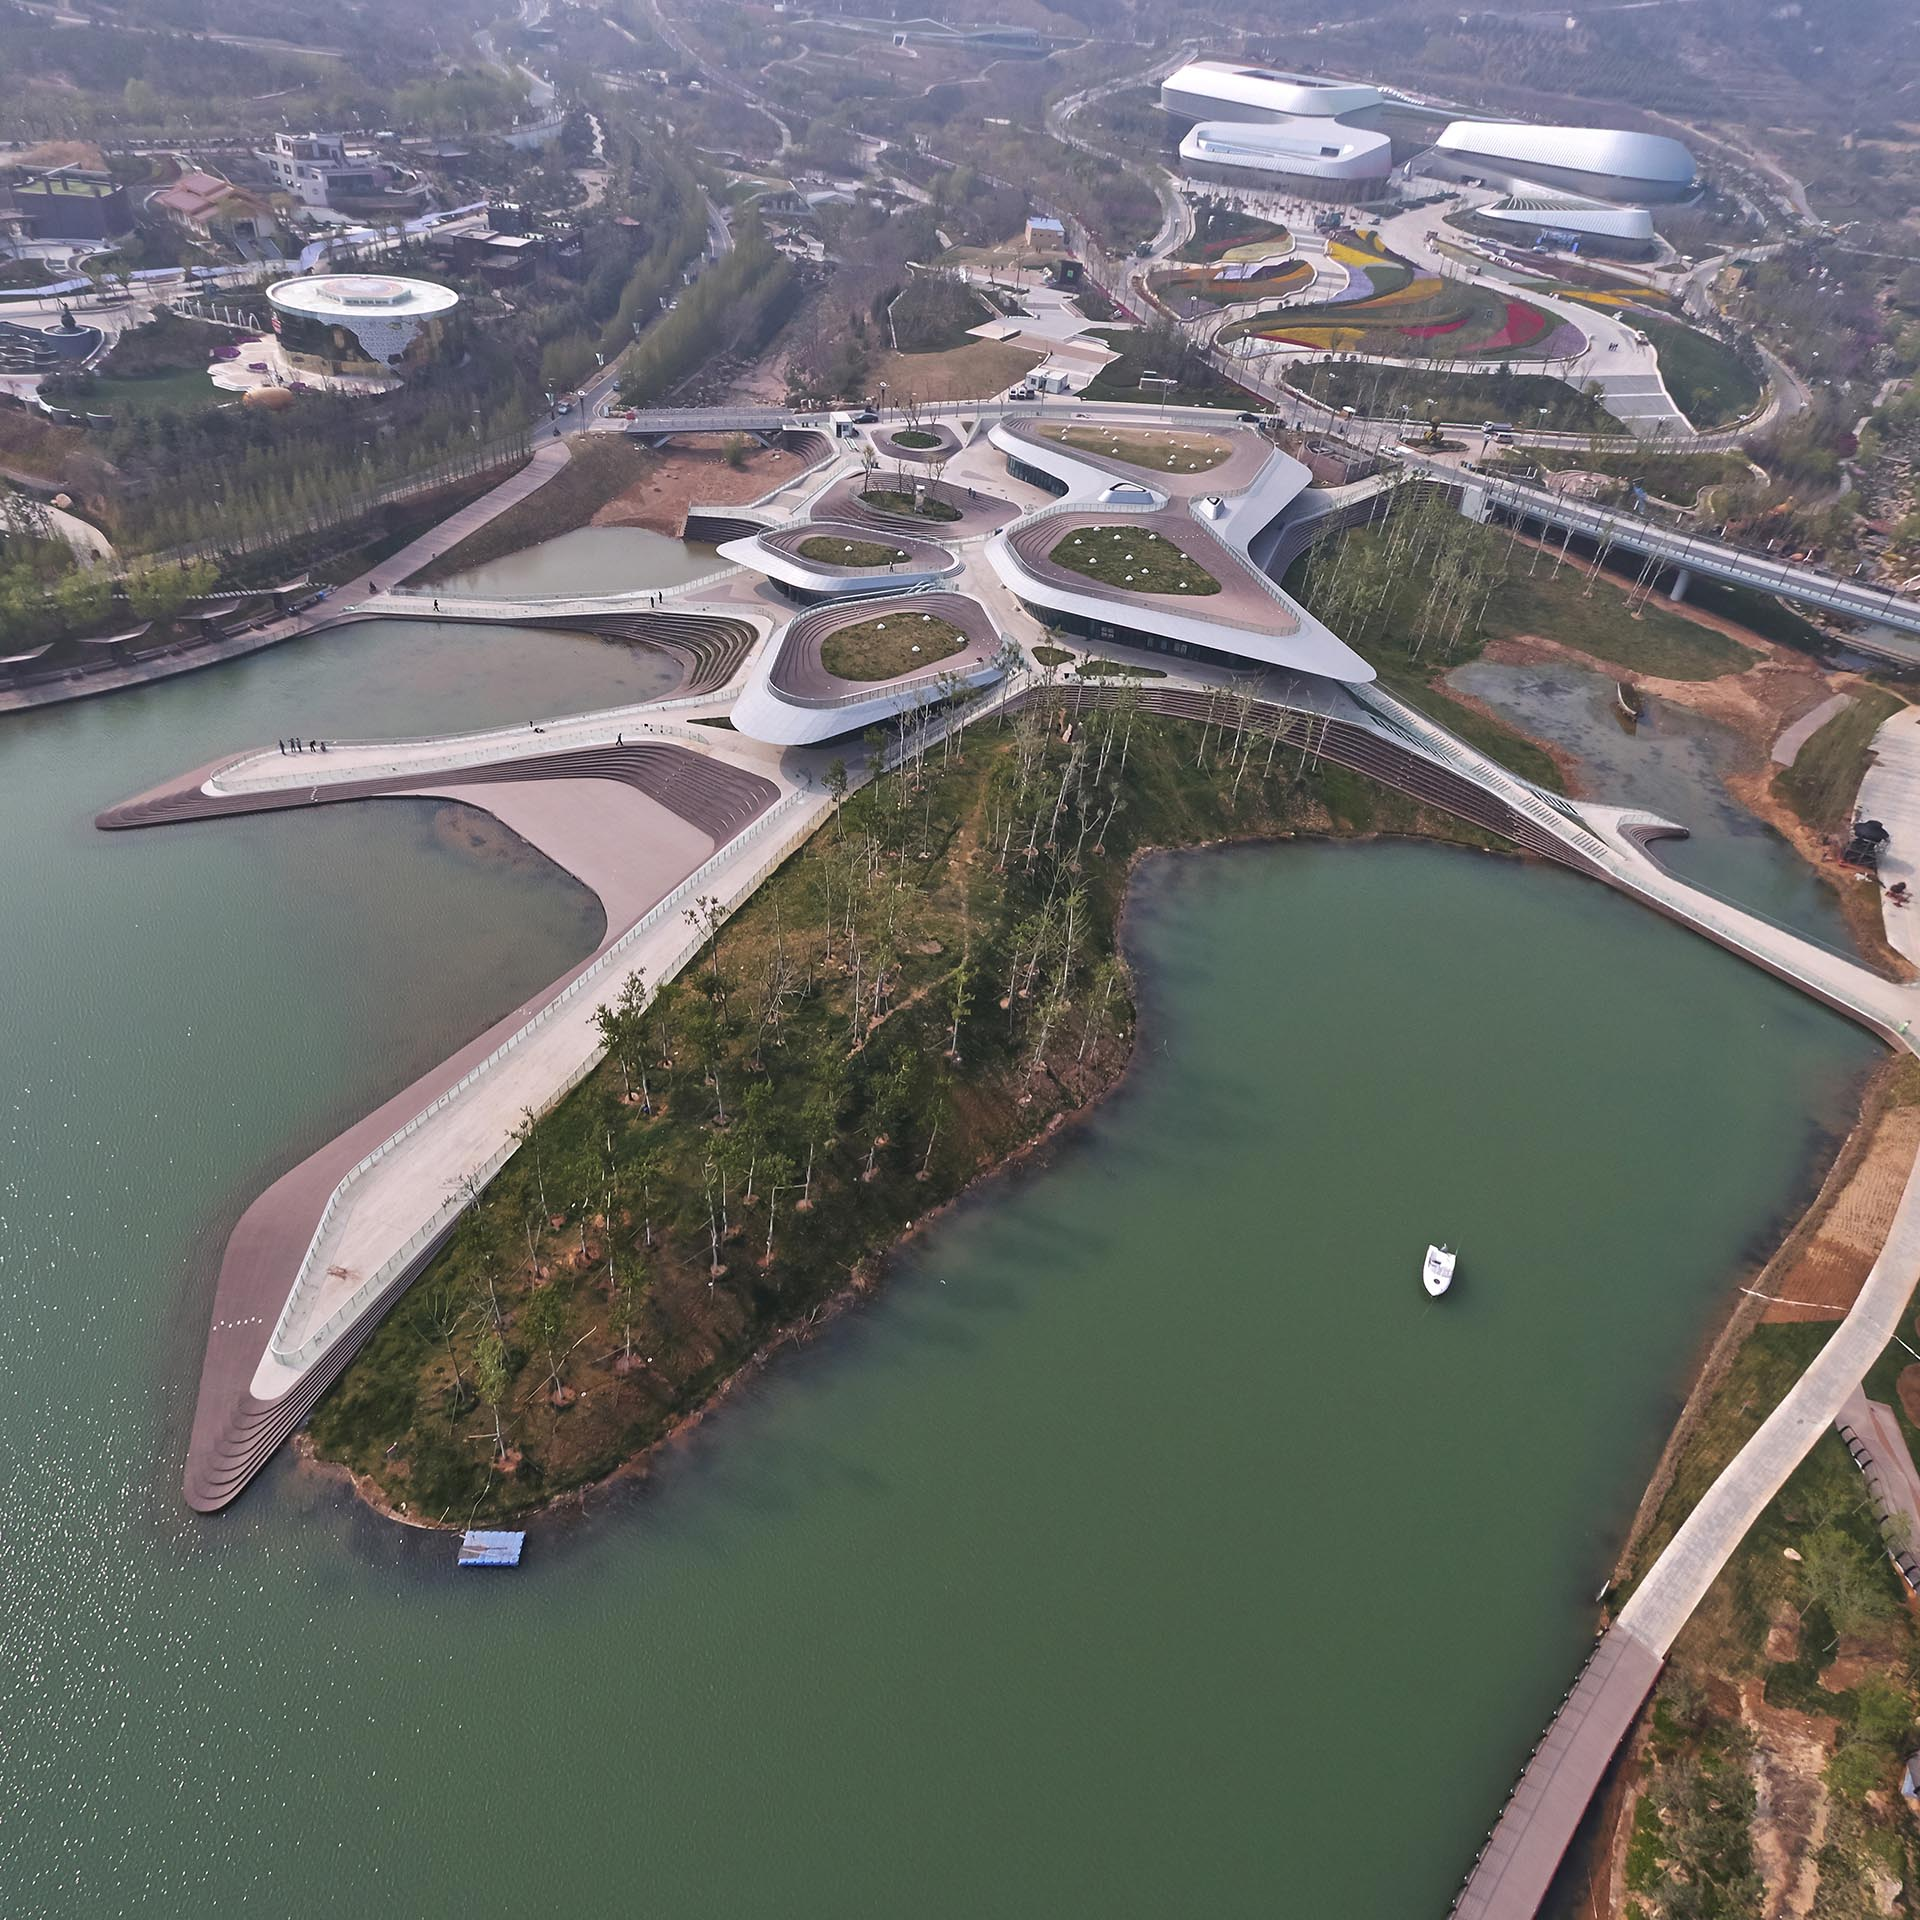 Heavenly Water Service Center Service Center by Zhenfei Wang.